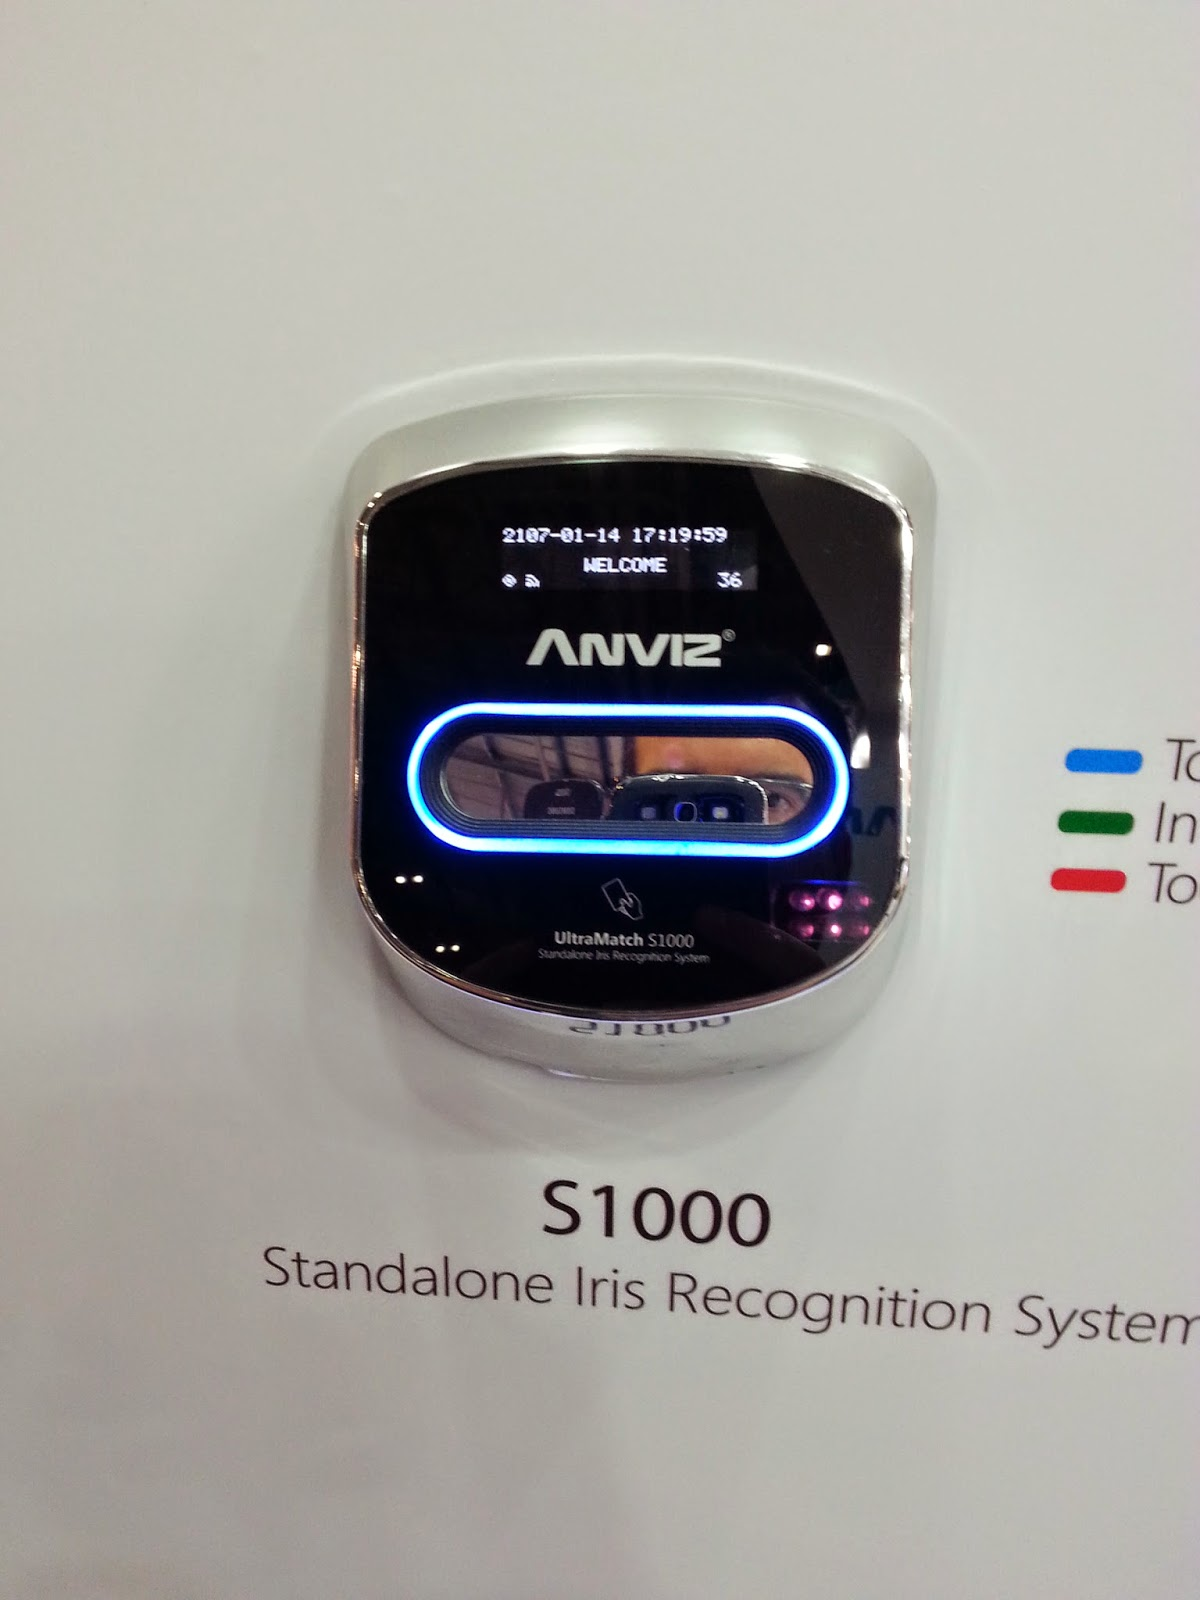 Terminal Iris de control de accesos Ultramatch S1000 de Anviz